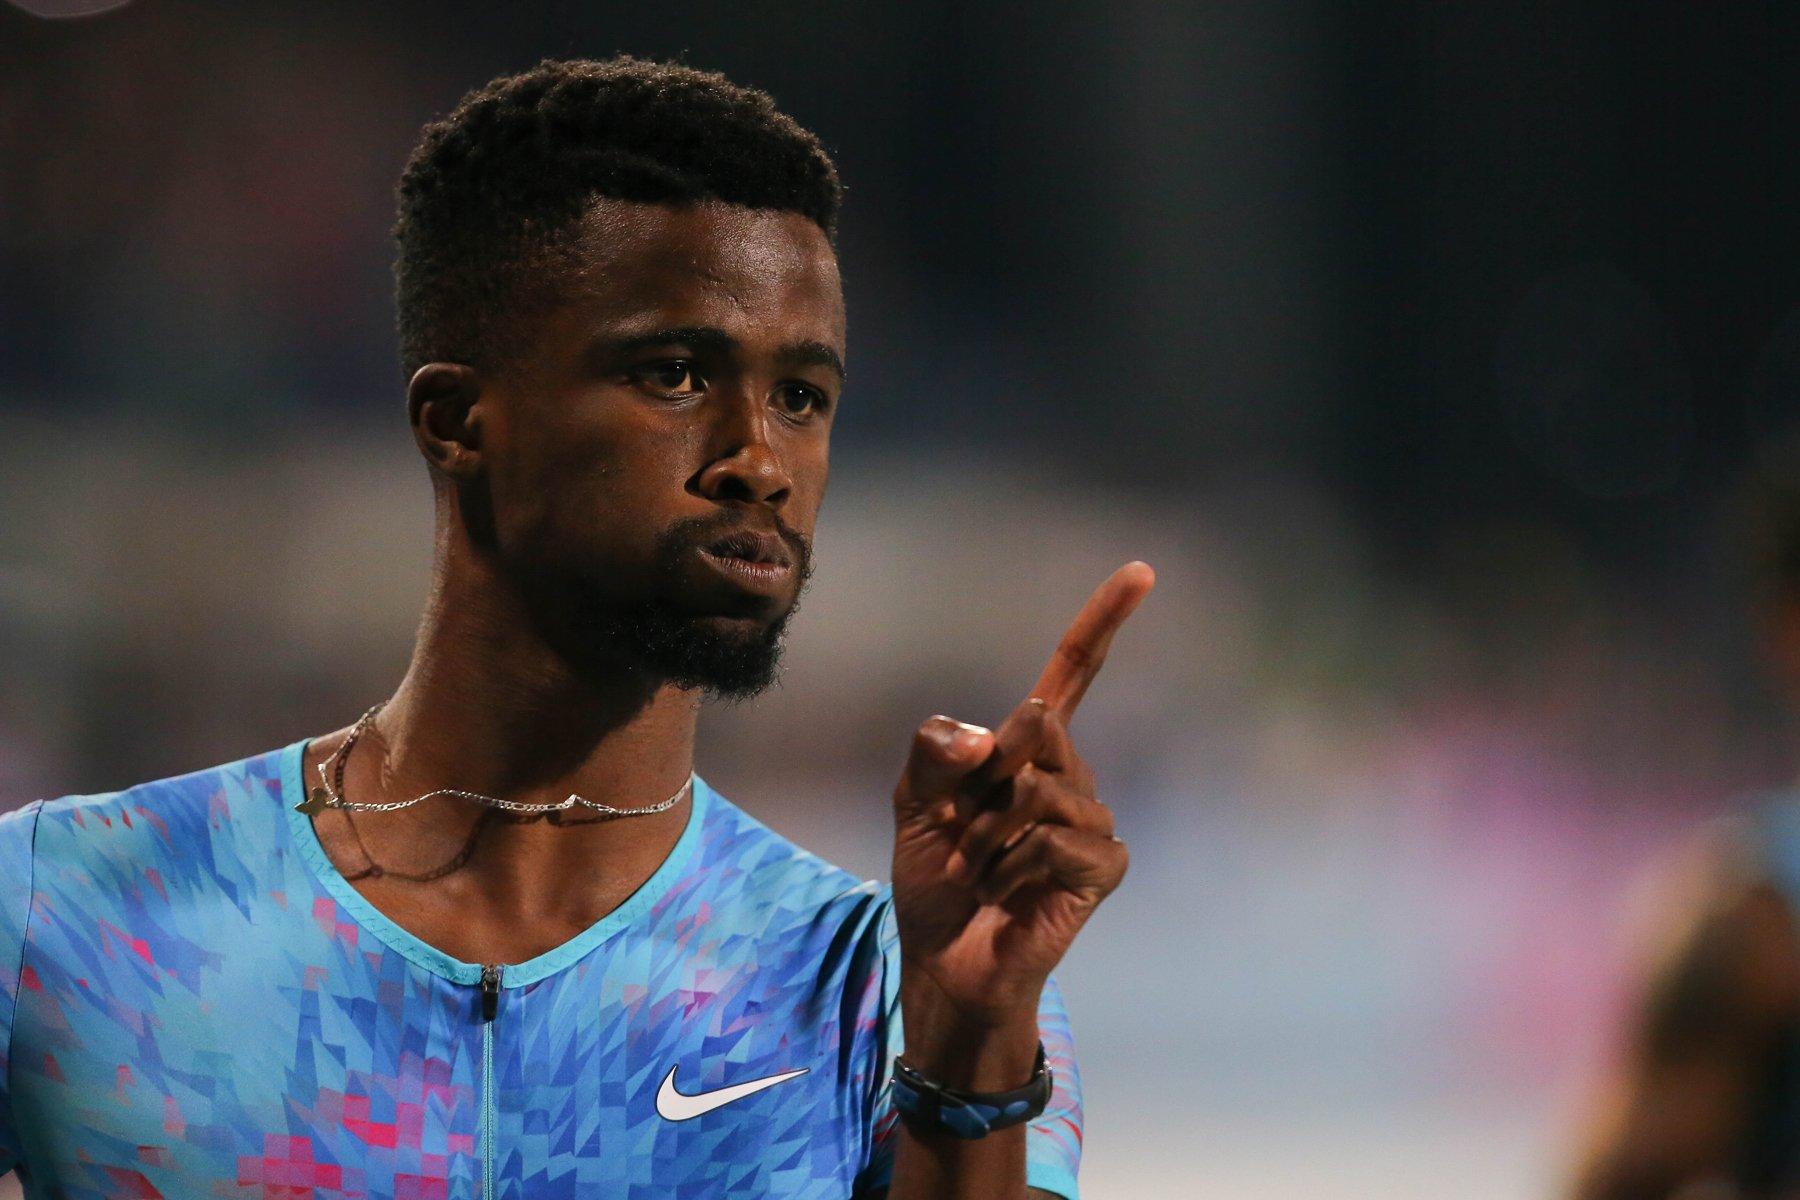 Anaso Jobodwana, winner of 150m dash. Photo Credit: Roger Sedres